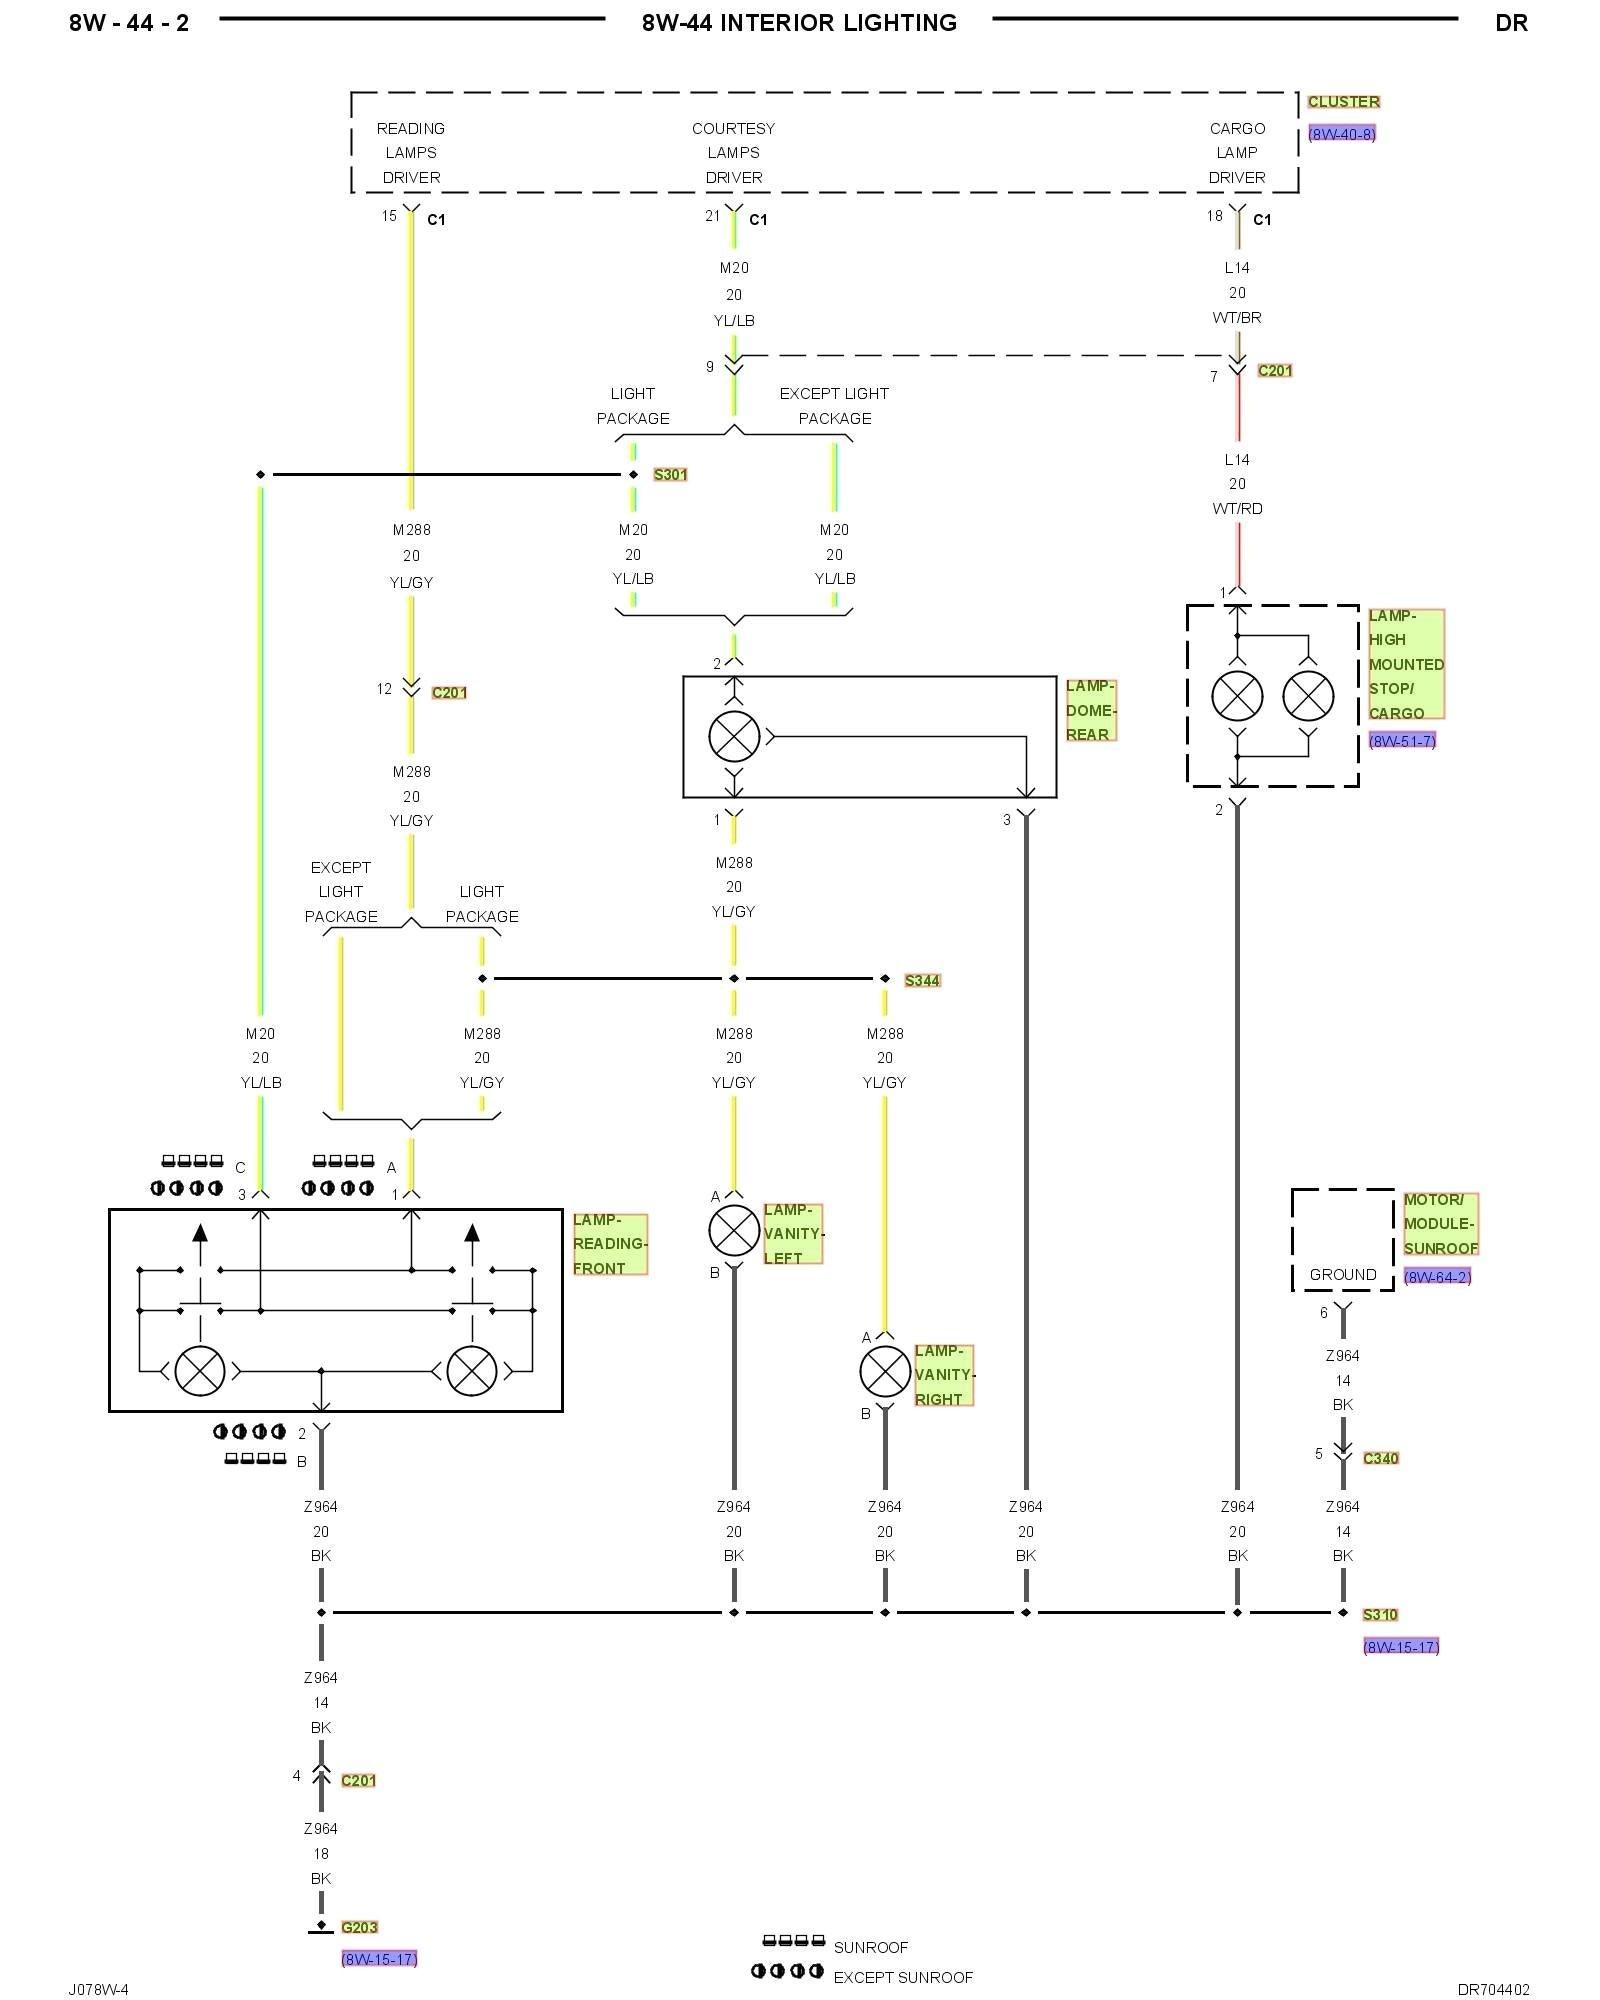 hight resolution of 2004 dodge ram 2500 wiring diagram wiring diagram 2004 dodge ram 1500 new best ideas